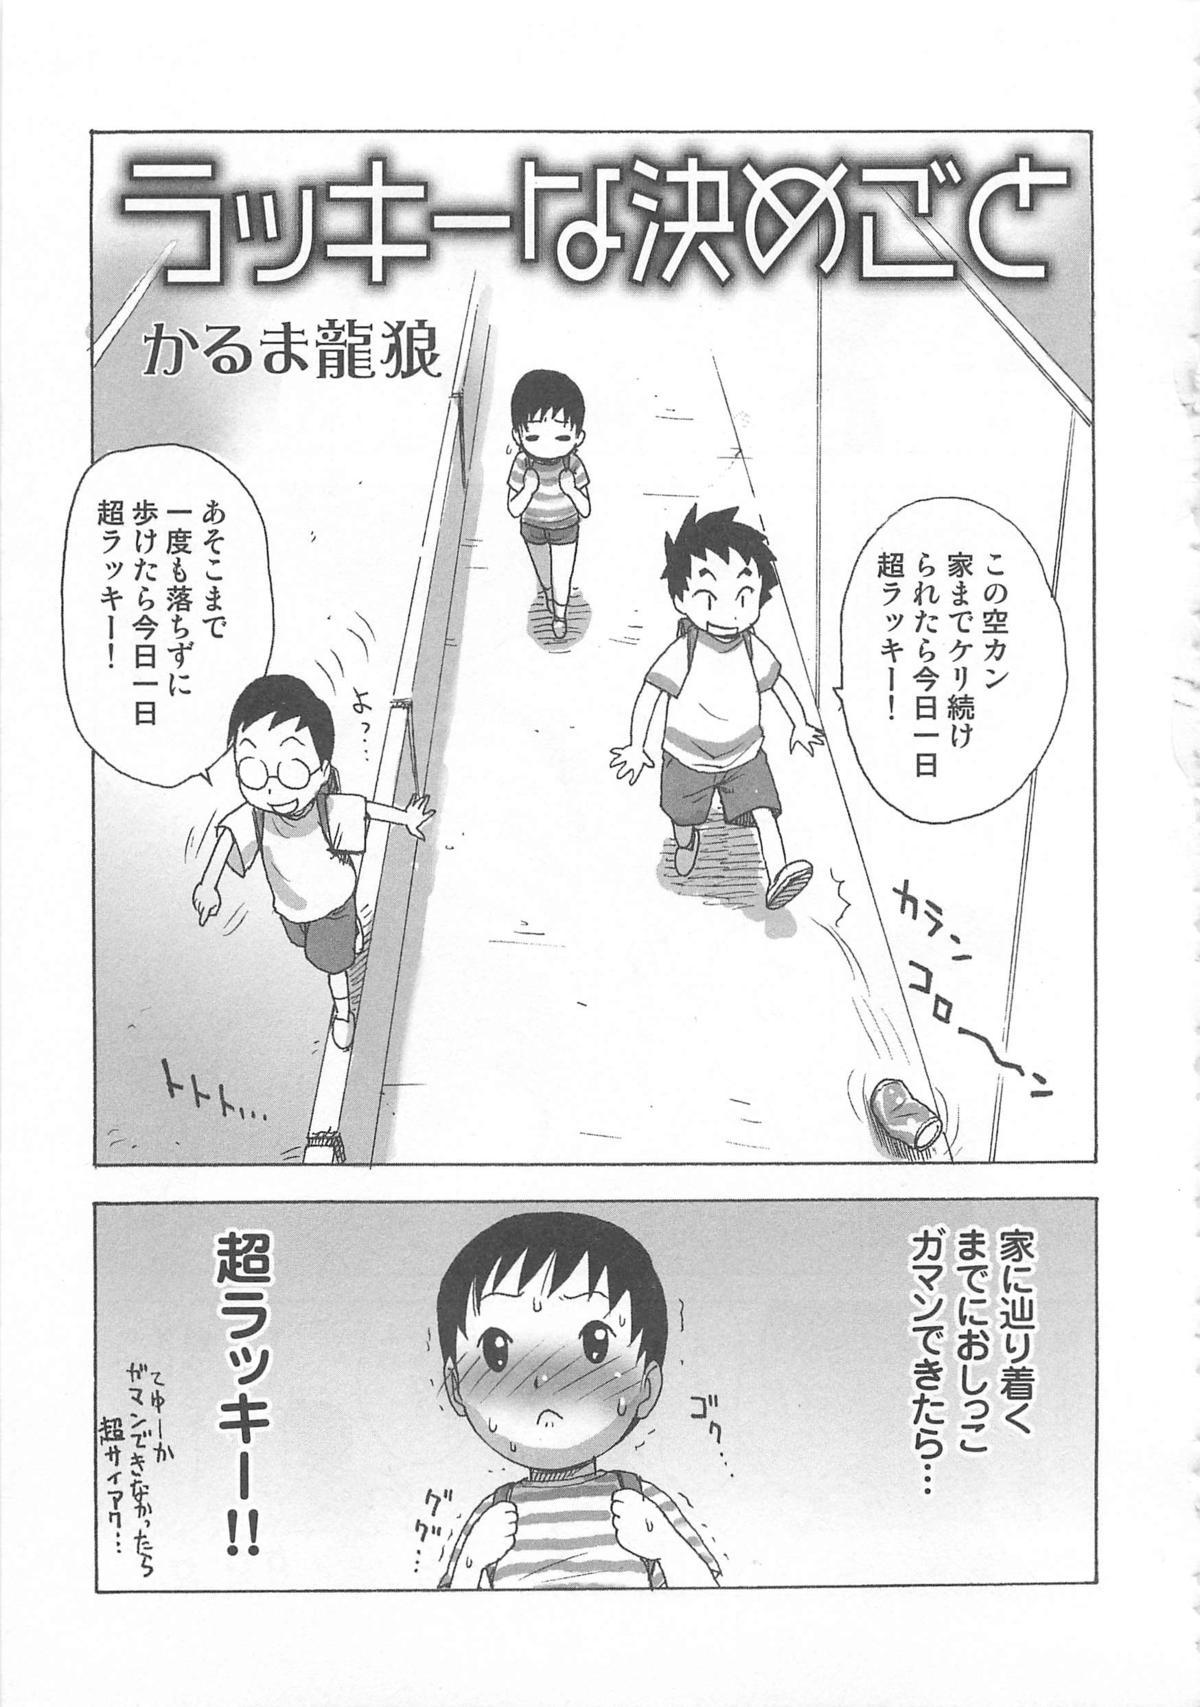 Otokonoko HEAVEN Vol. 02 Dokidoki Chikan Taiken 95